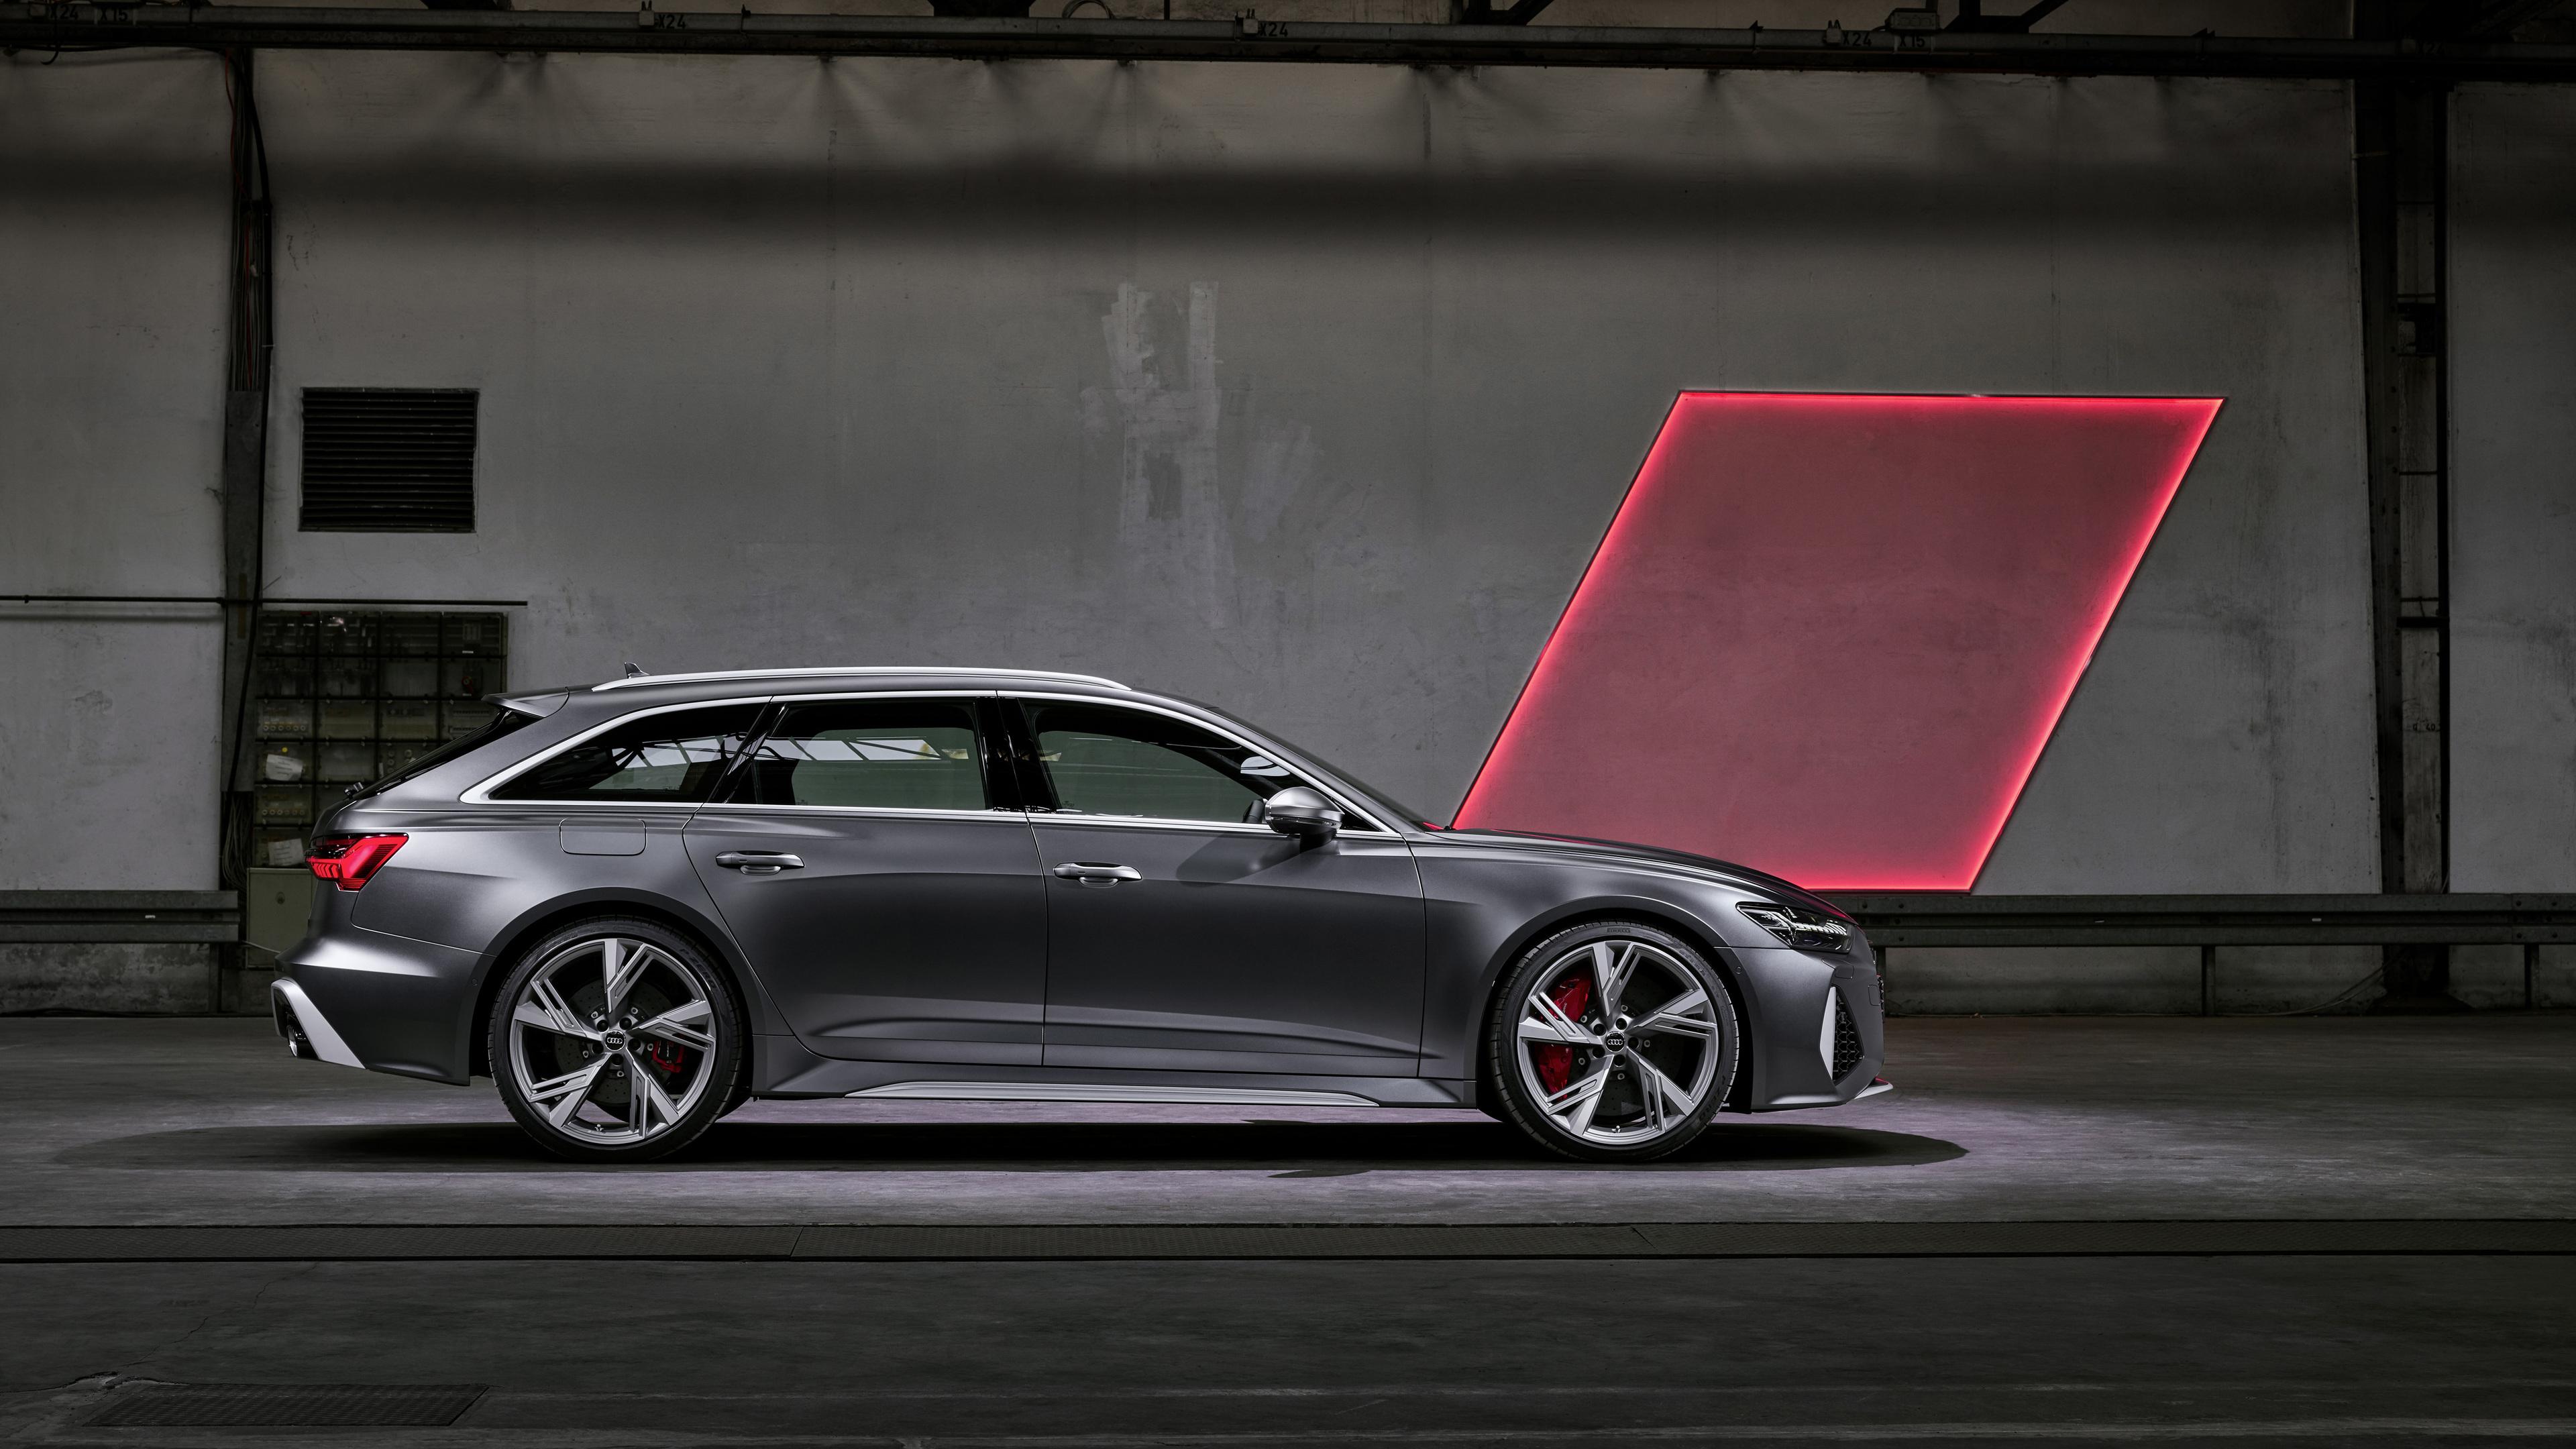 Wallpaper 4k Audi Rs 6 Avant Side View 2019 Cars Wallpapers